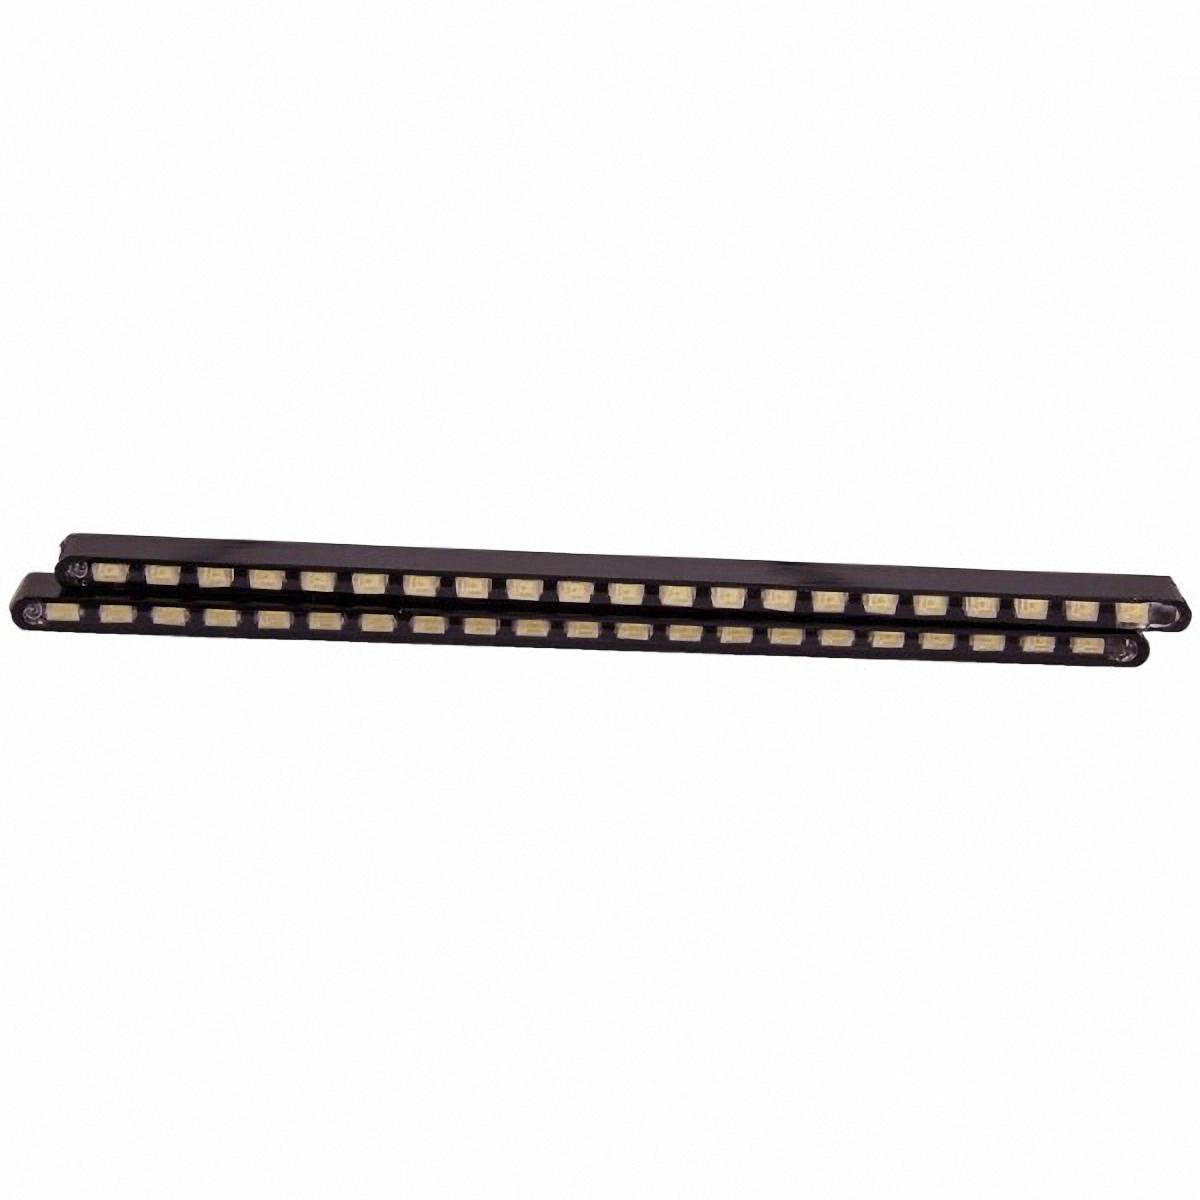 Skyway Ходовые огни 21 диод. SHDX-21LED(5630)10503Тип диода 5630Количество диодов 21 шт. Комплектация:Ходовые огни комплект – 2 шт.Самоклеящаяся лента – 2 шт.